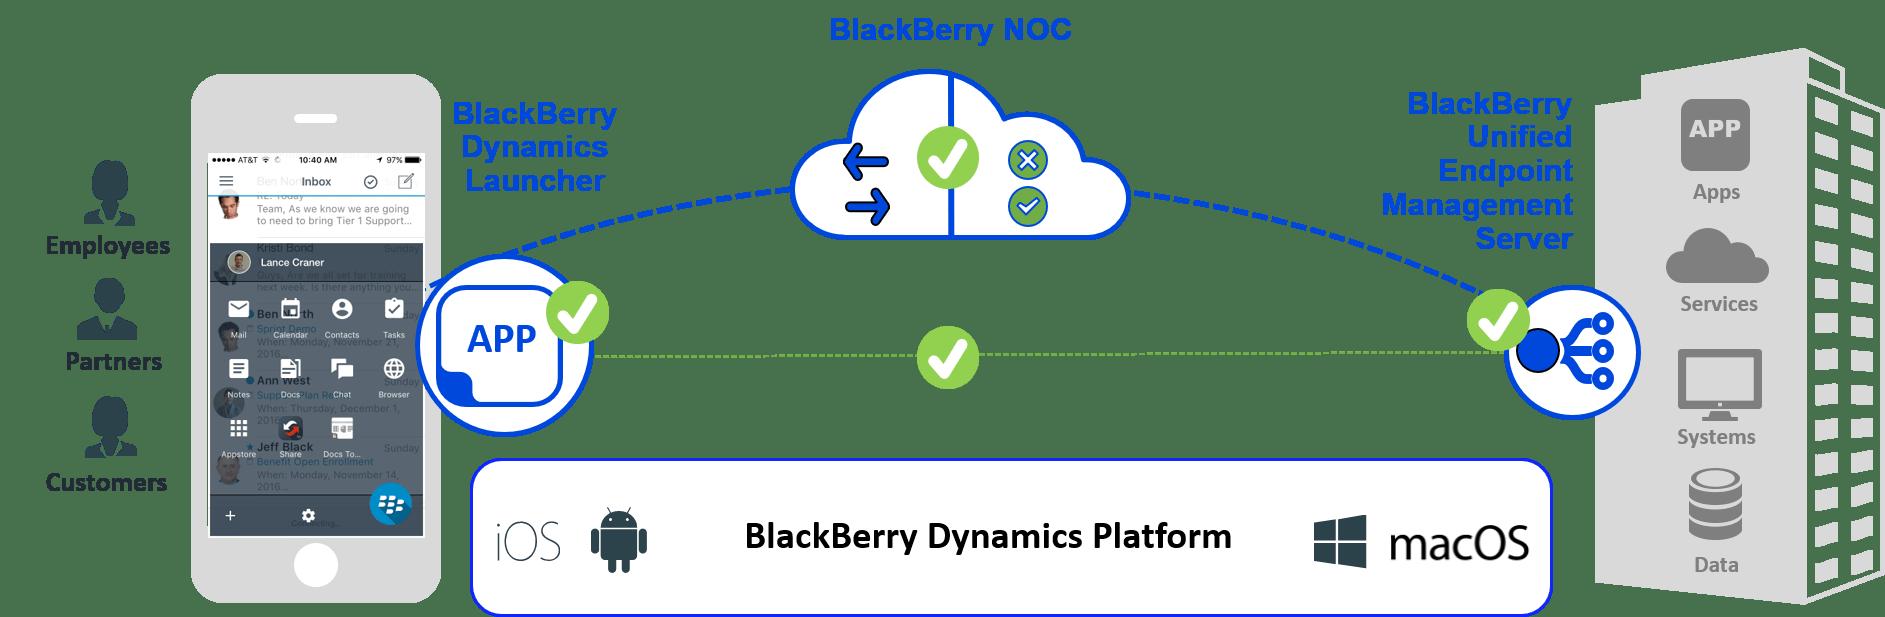 BlackBerry Dynamics Architektur